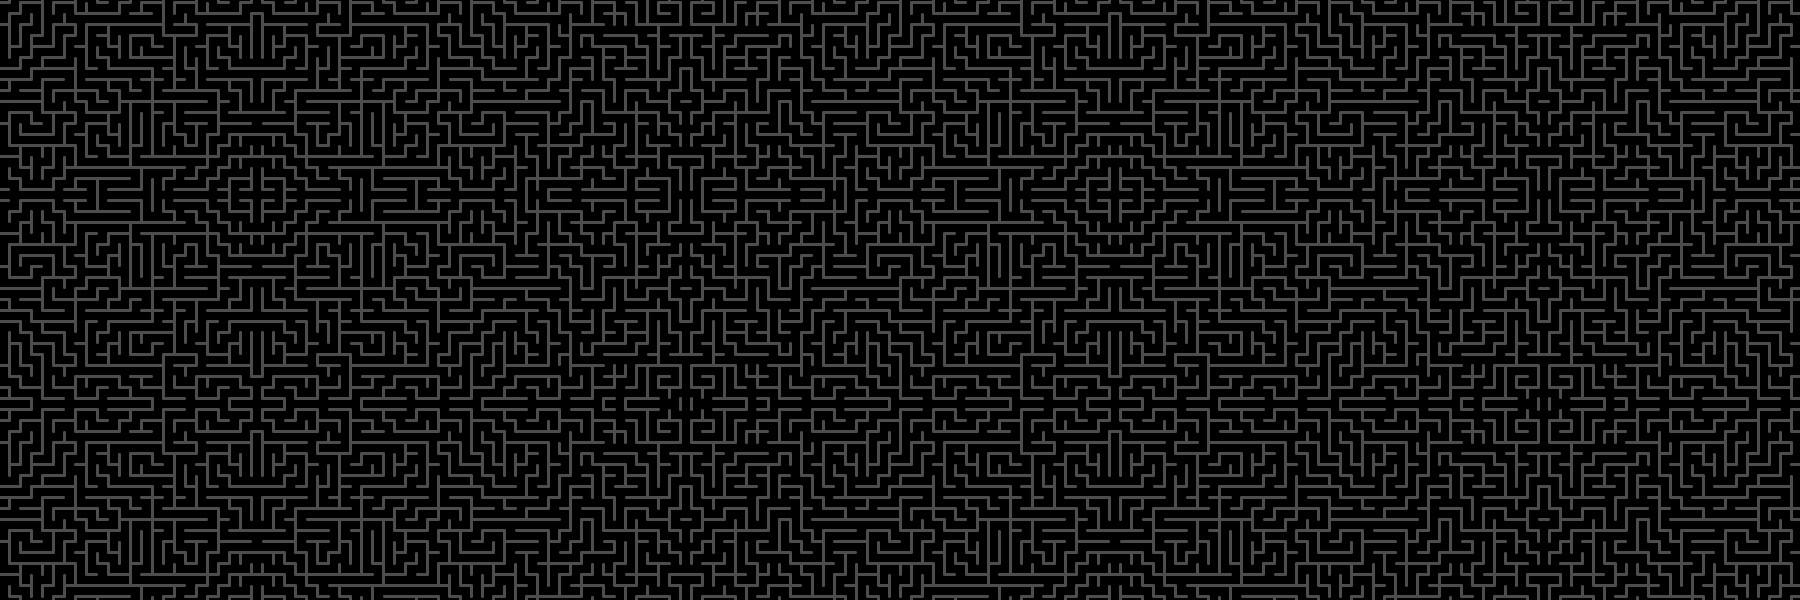 KeyMasters Escape Rooms Hamilton - Maze